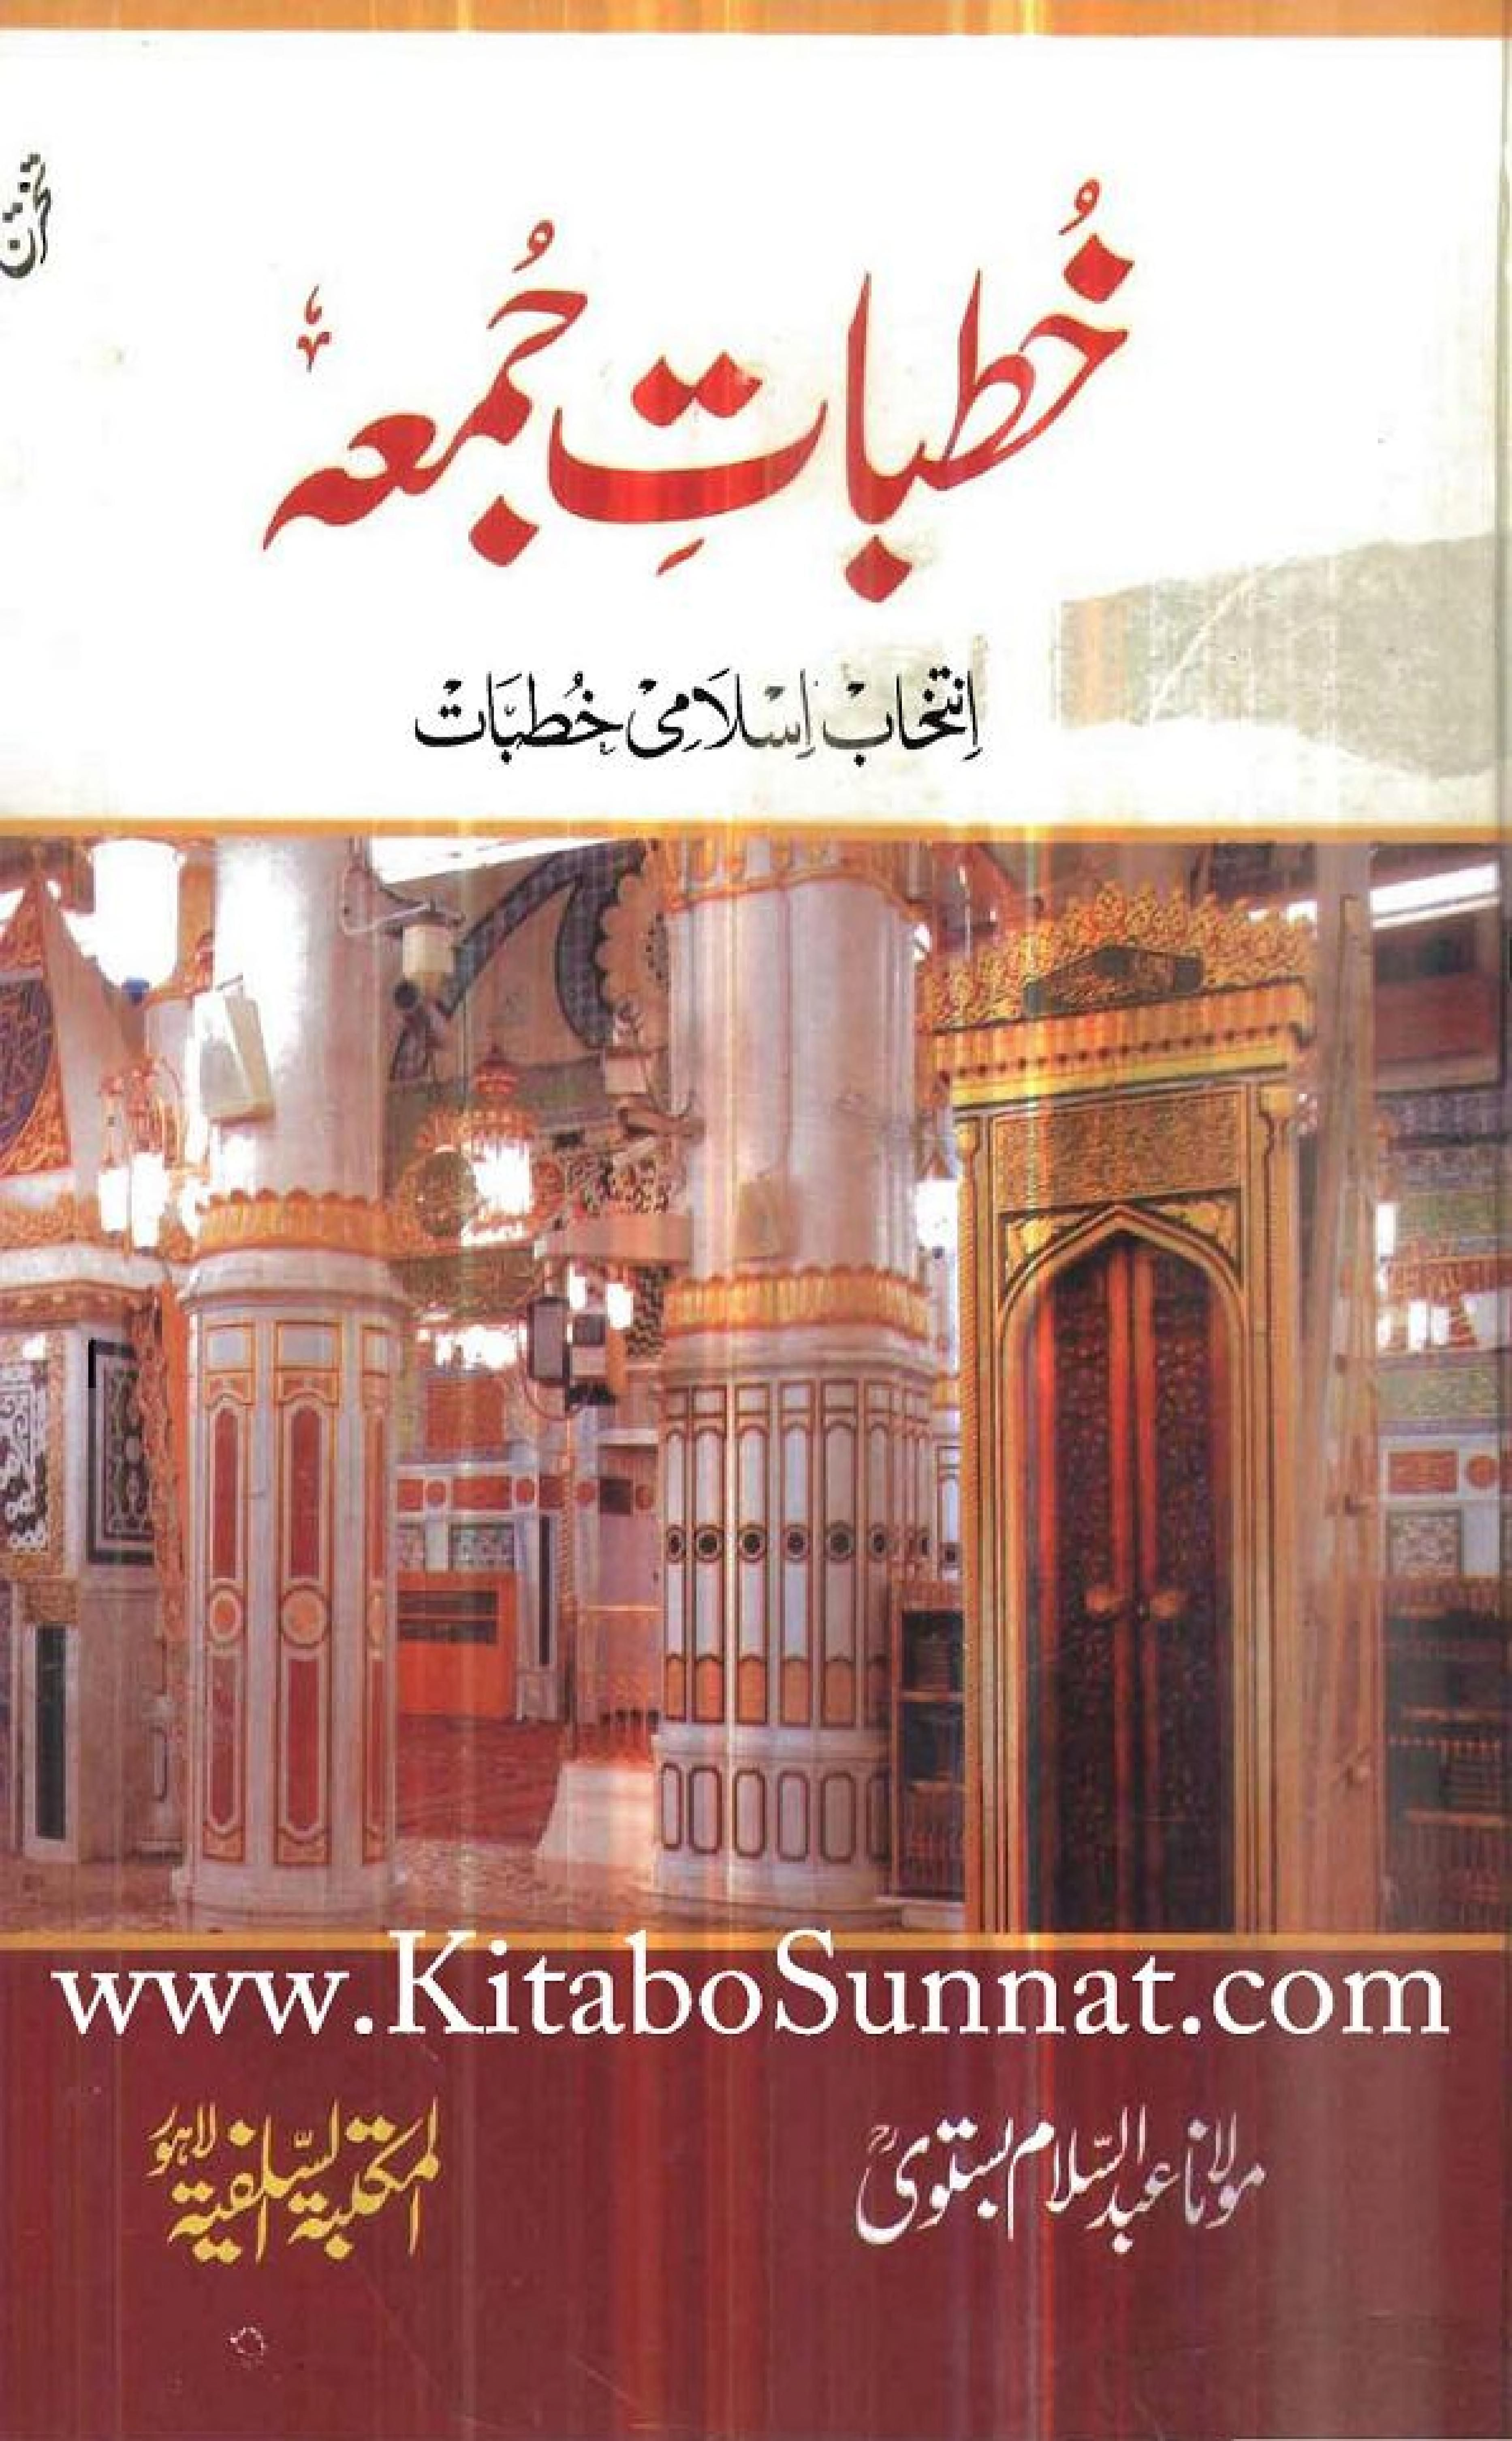 Khutbate-Juma-Intakhab-Islami-Khutbat : Free Download, Borrow, and